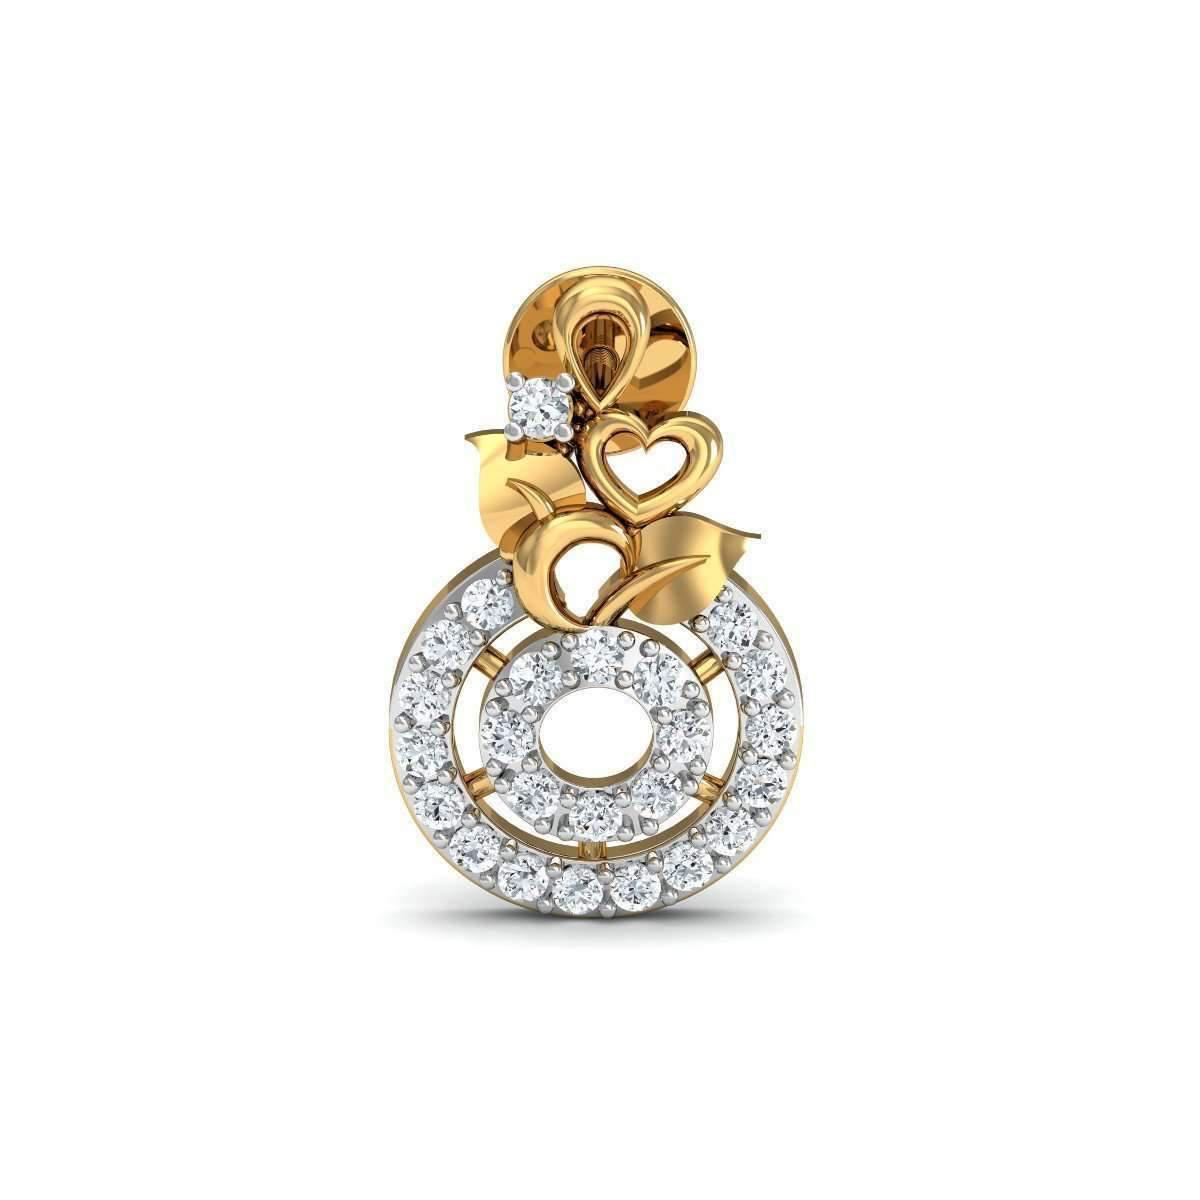 Diamoire Jewels Burgeon Diamond Stud Earrings in 18Kt Yellow Gold Oa0aHJ6